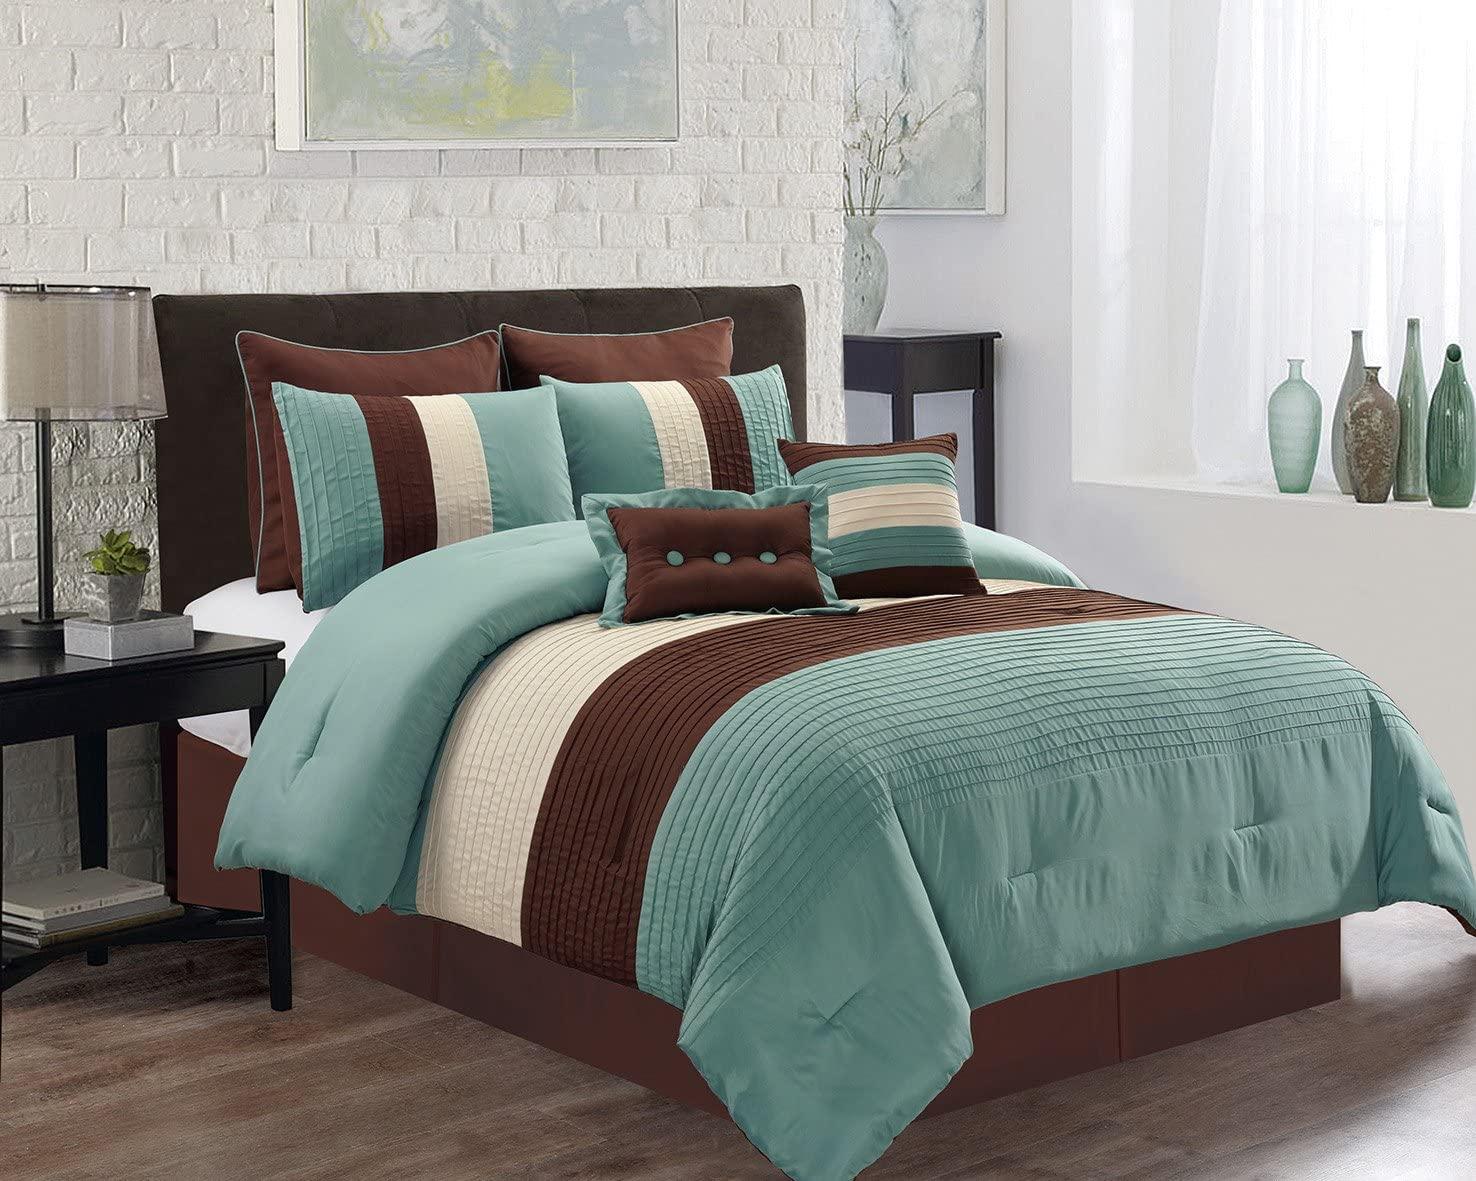 Grand Linen 8 Piece King Size Light Silver Blue/Brown/Beige Pin Tuck Stripe Regatta Goose Down Alternative Comforter Set 104